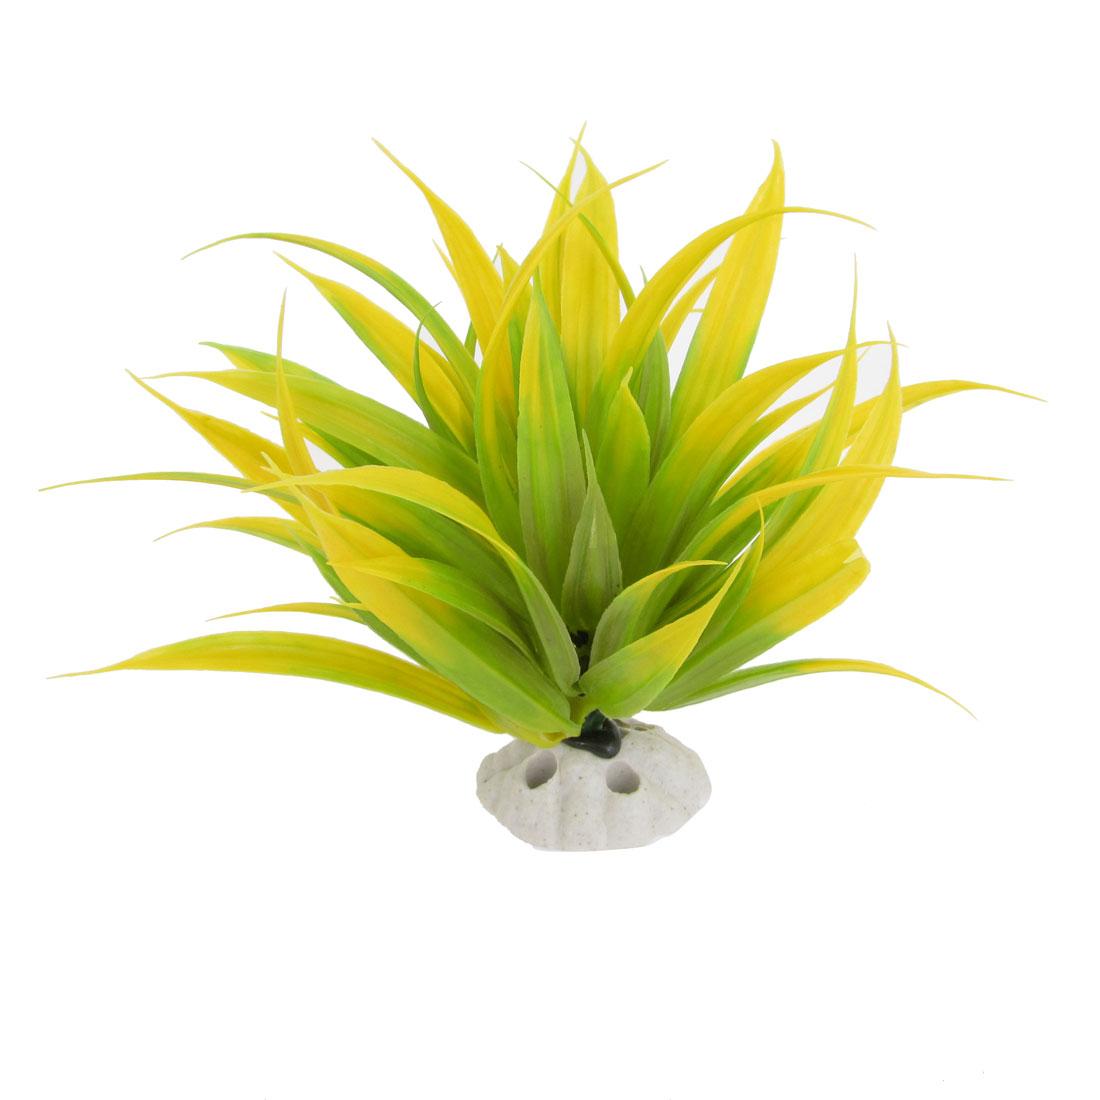 "Aquarium Aquascaping Yellow Green Plastic Water Plant Grass Decor 6.7"" High"